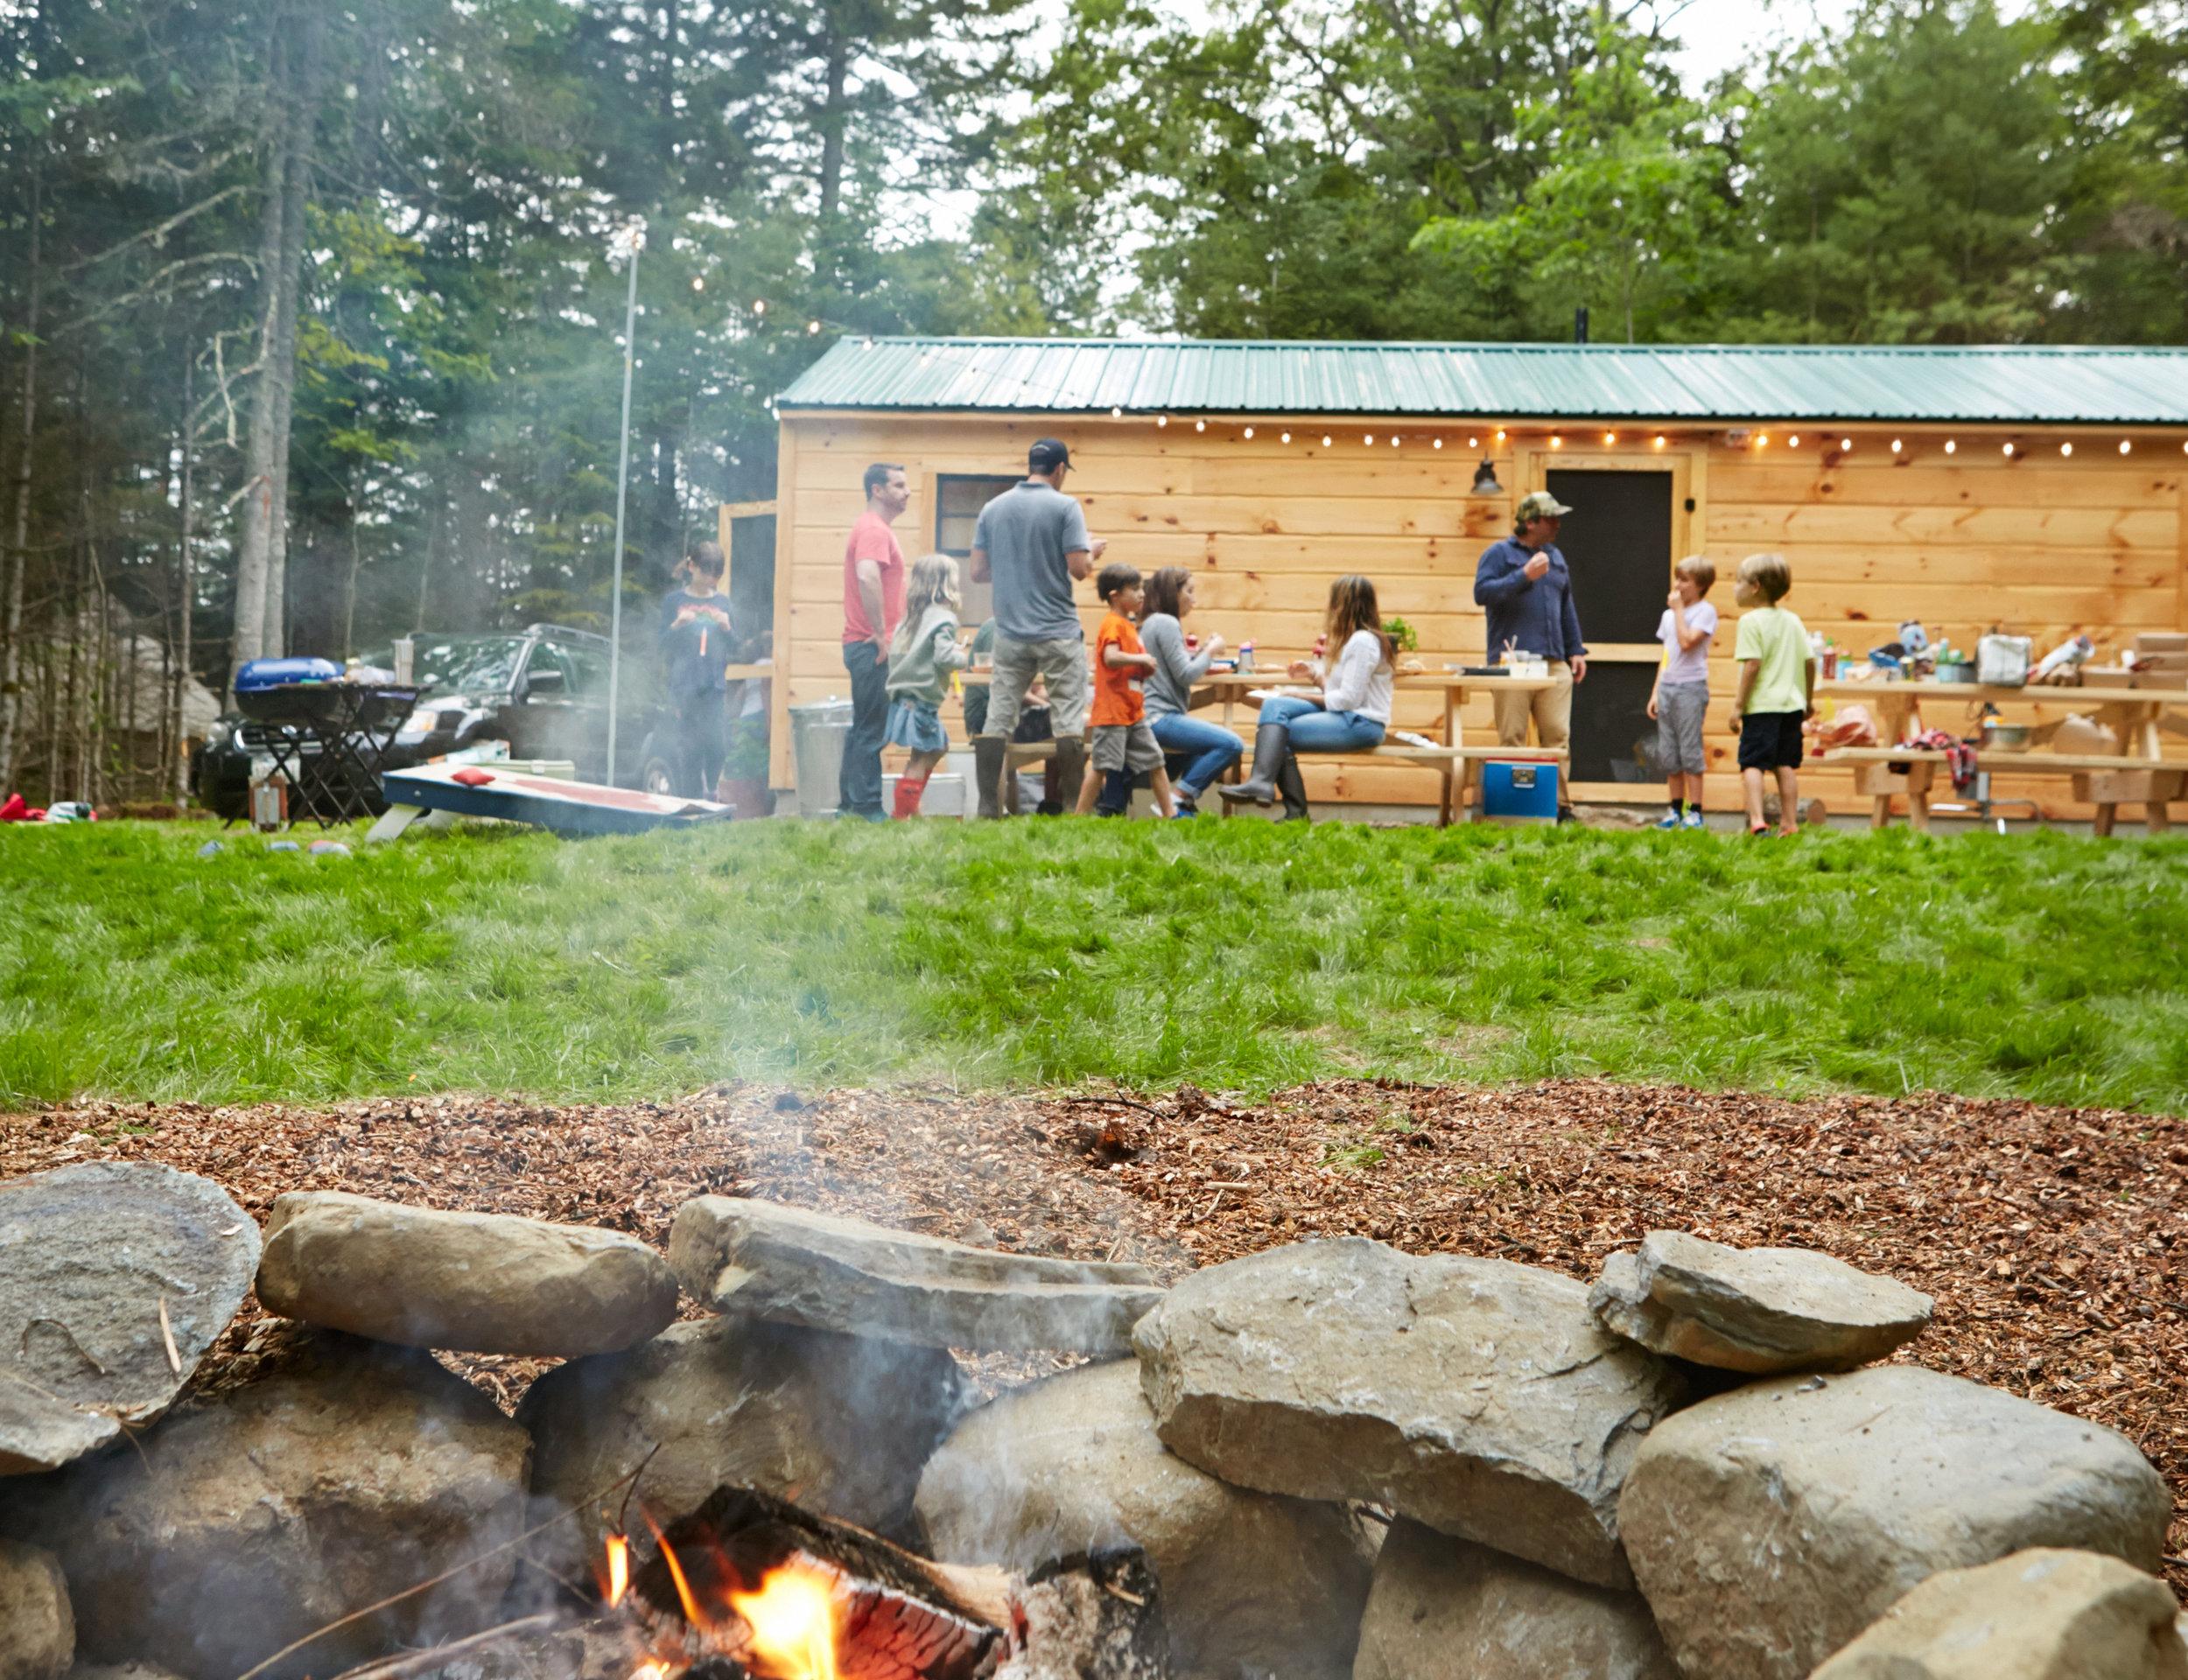 Tops'l_campfire_01.jpg